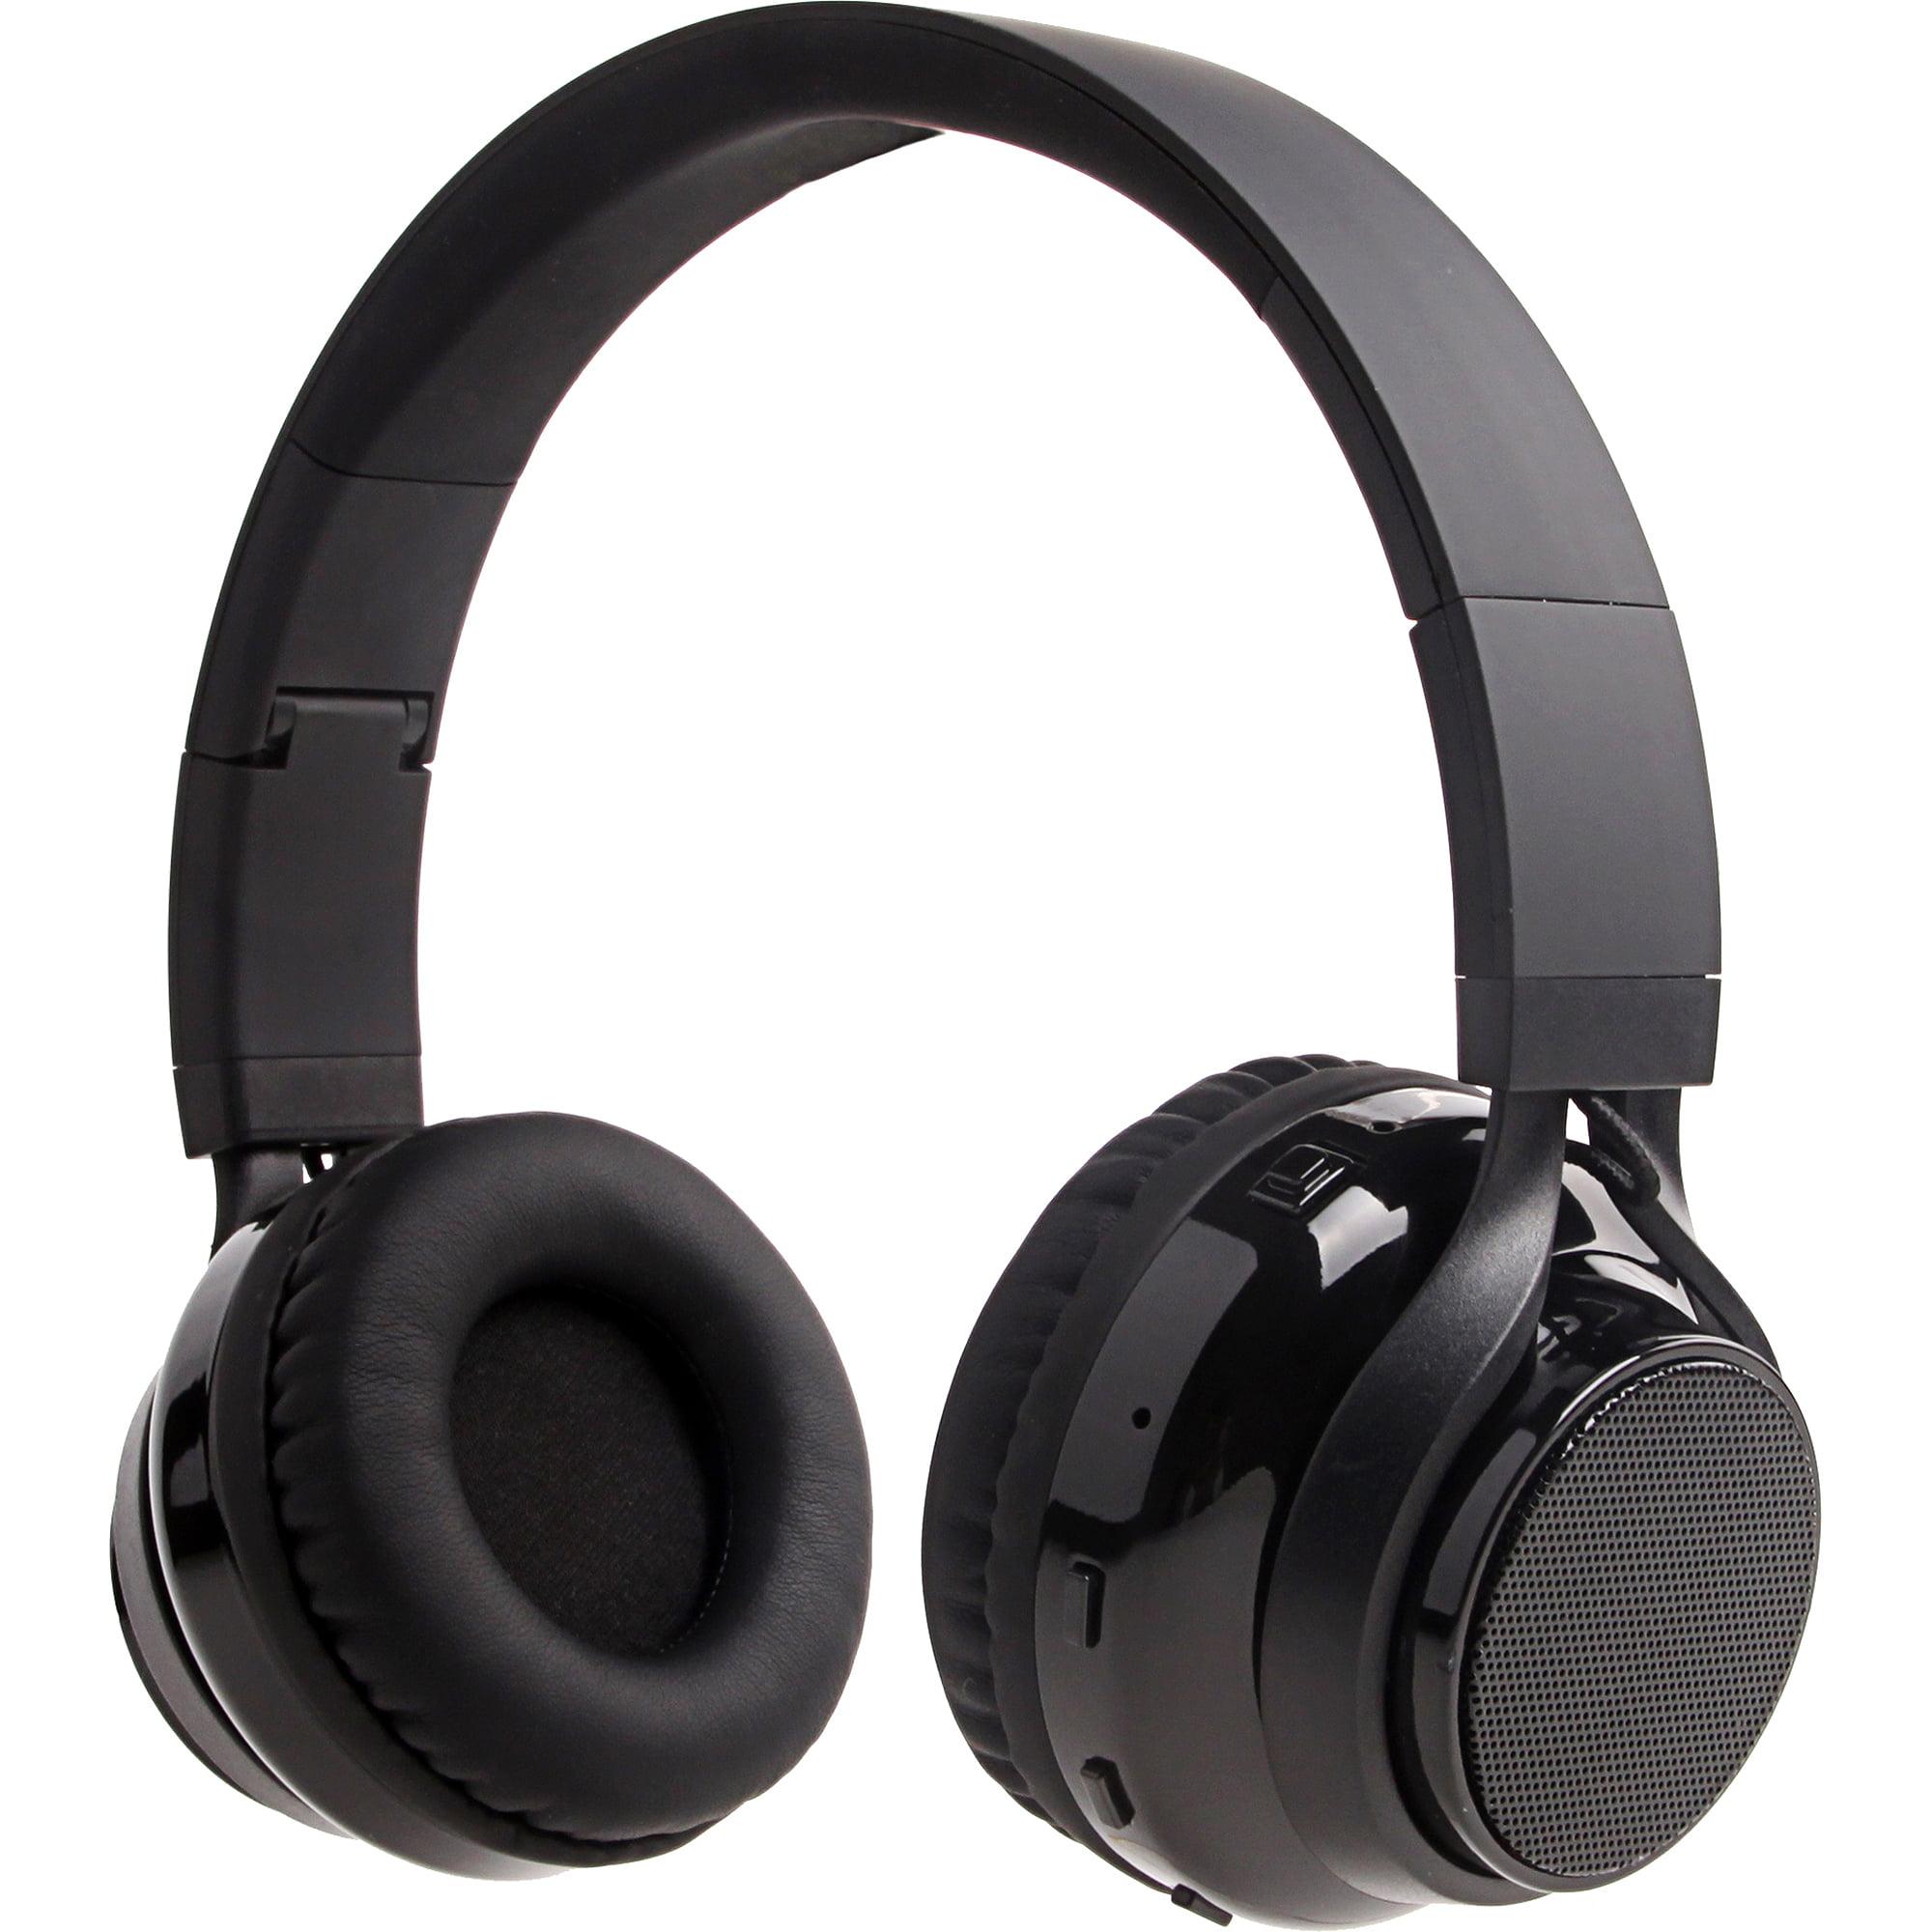 iLive iAHB284B DUO Bluetooth Headphones and Portable Speakers